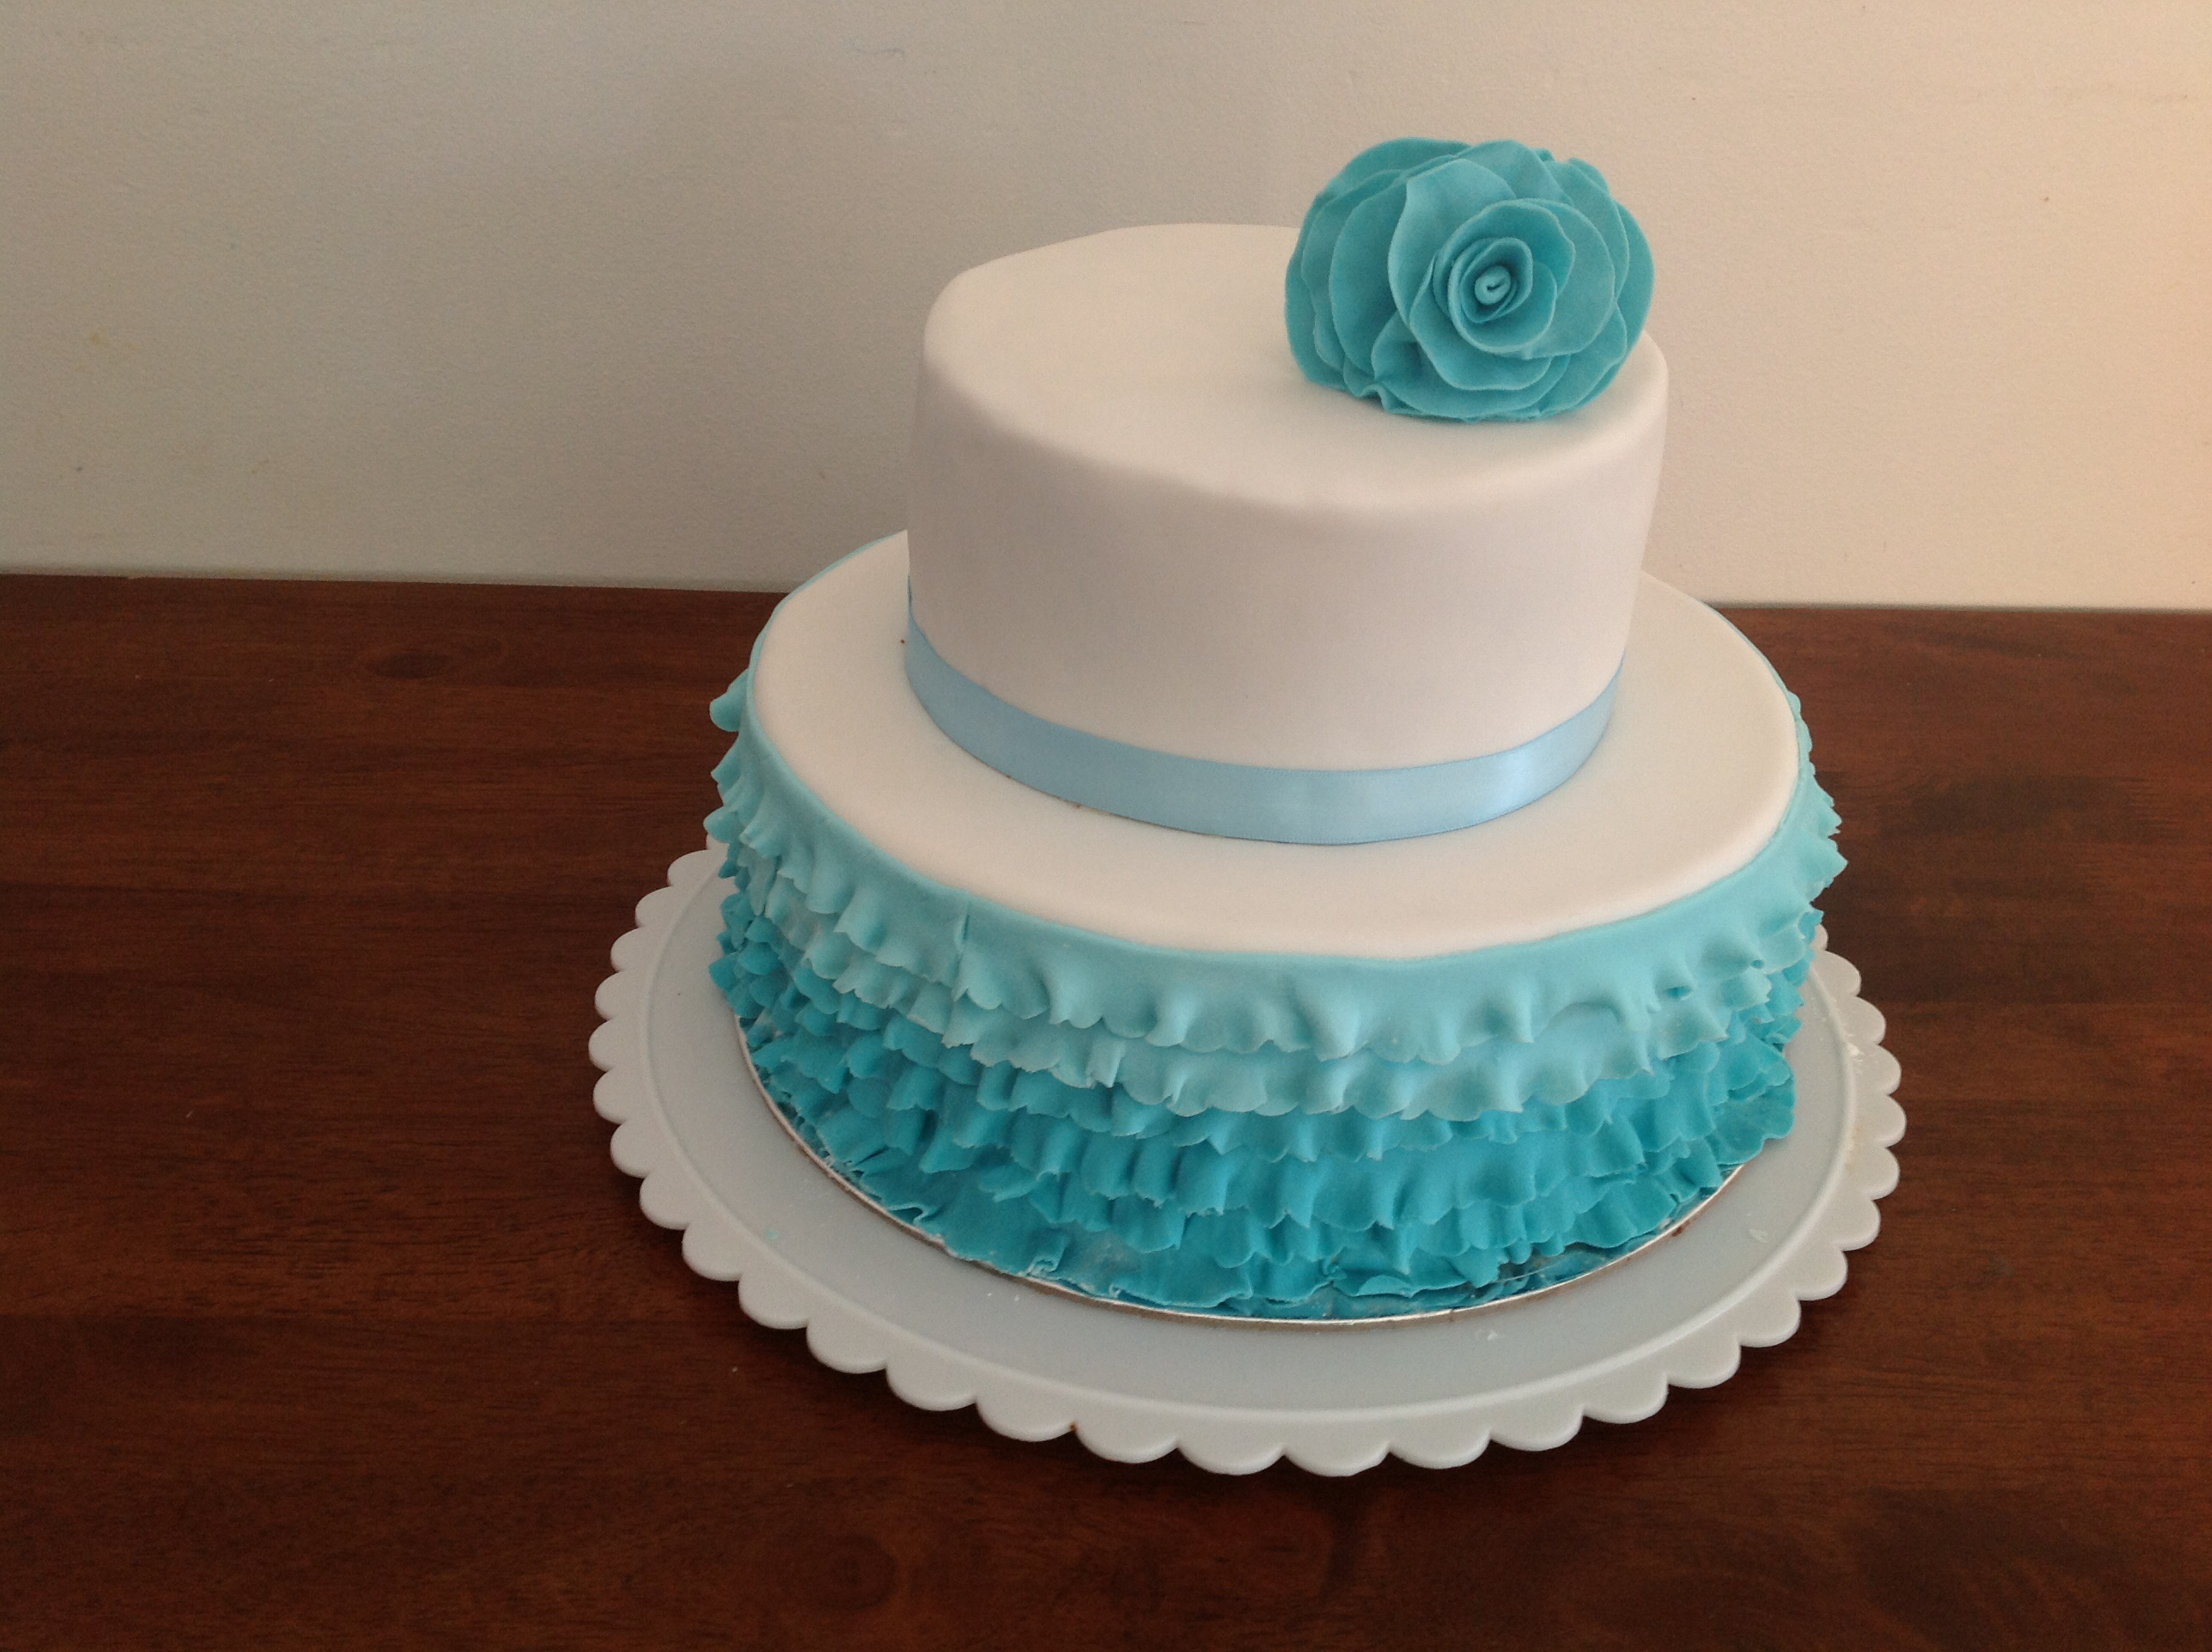 Cake Designs Coffs Harbour : Coastal Cake Design Gorgeous affordable cakes Page 4